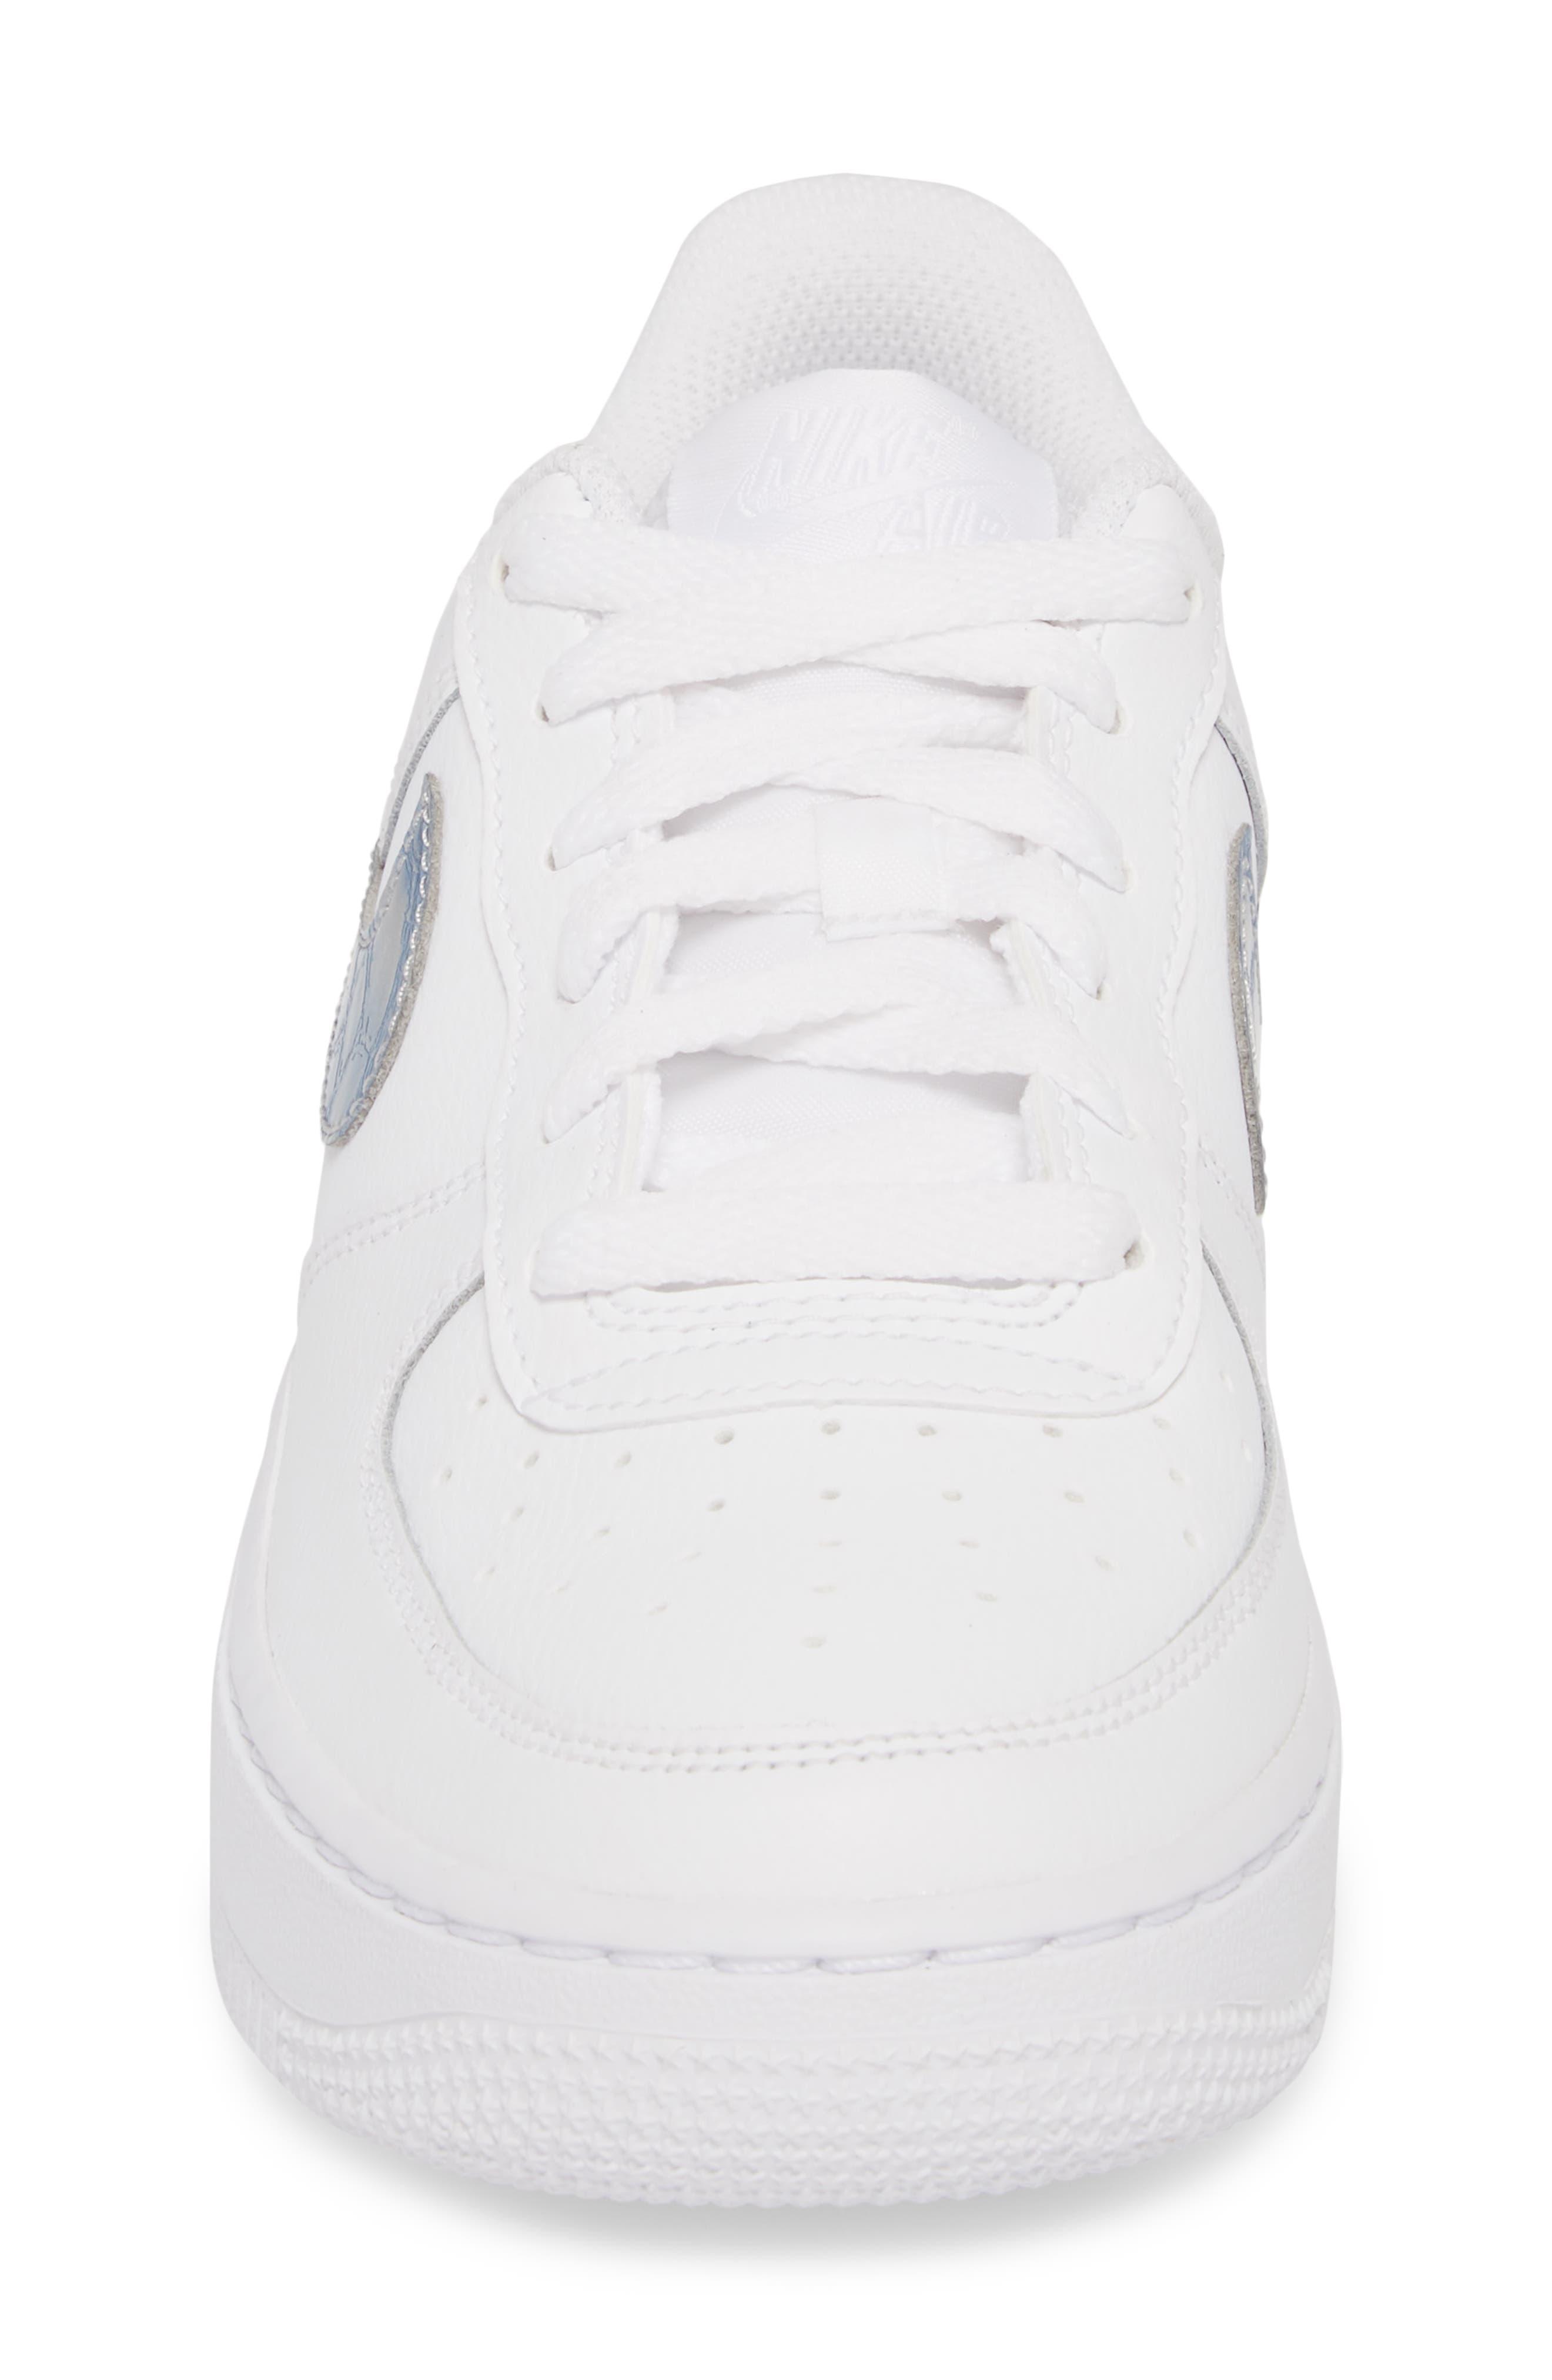 NIKE, Air Force 1 '06 Sneaker, Alternate thumbnail 4, color, 131